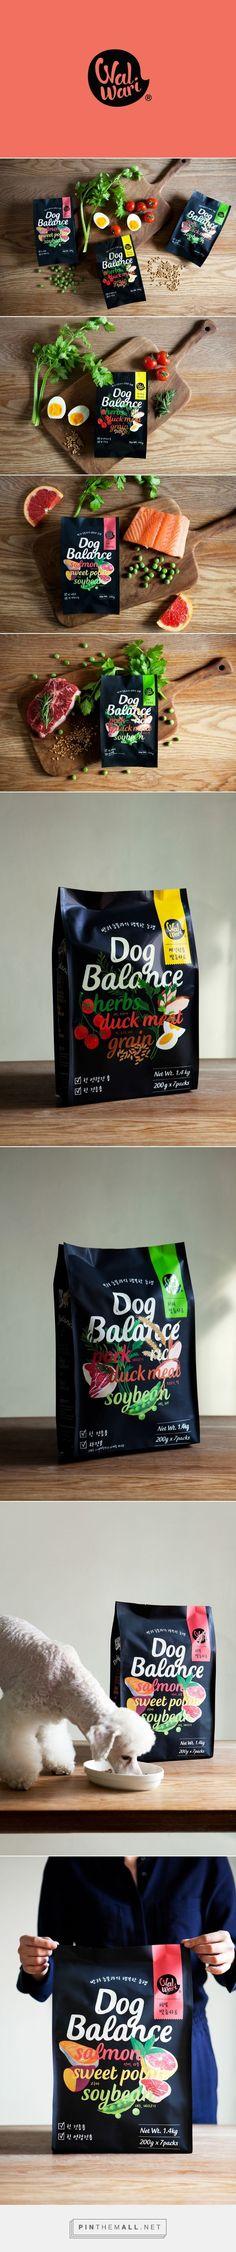 Dog Balance / pet food by Charry Jeon, Saerom Kang, ContentFormContext, KIWOONG HONG